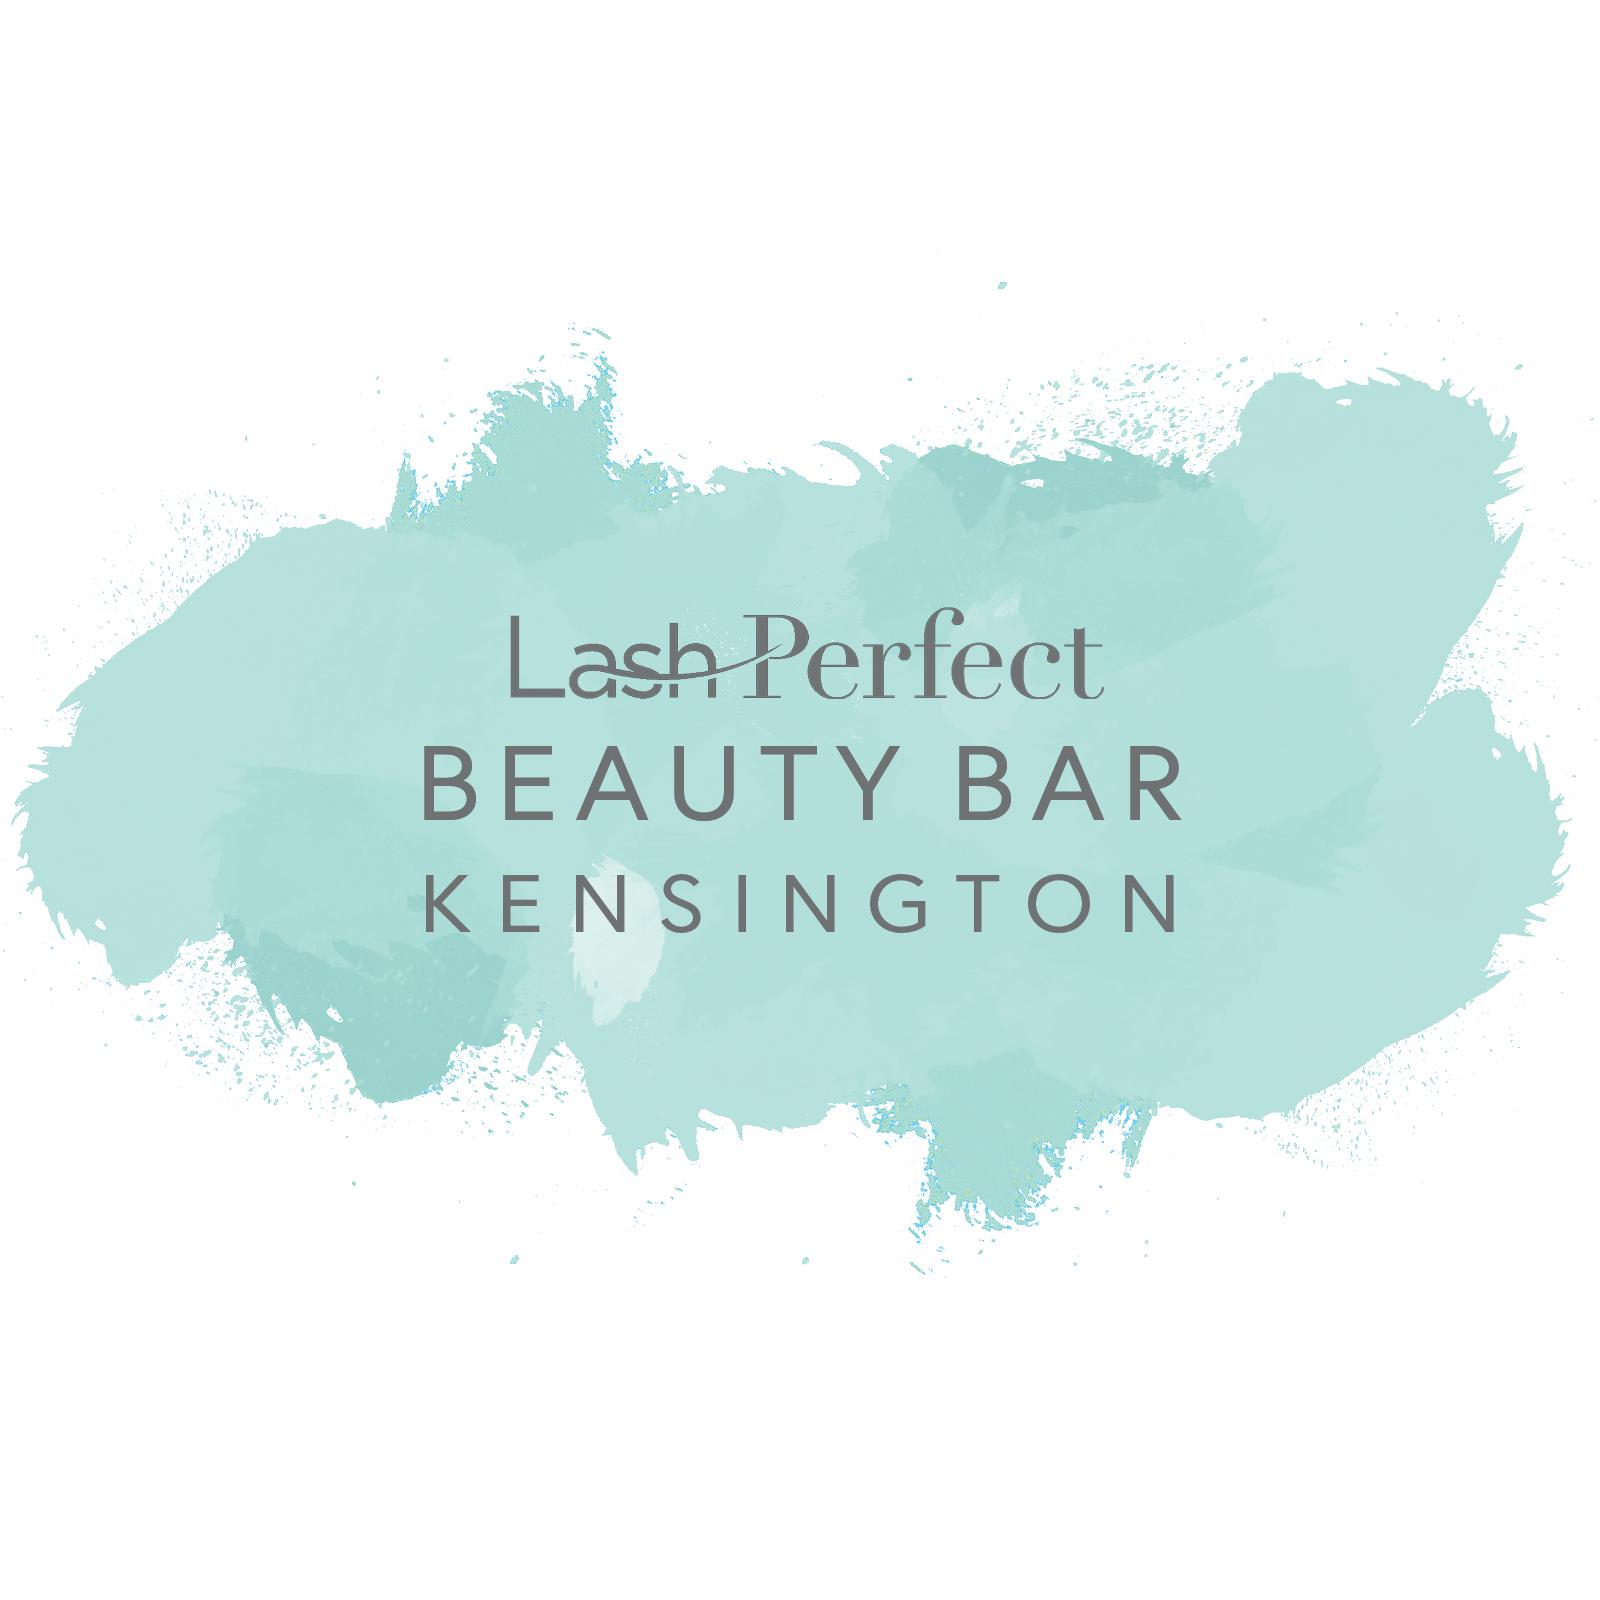 Beauty Bar Kensington